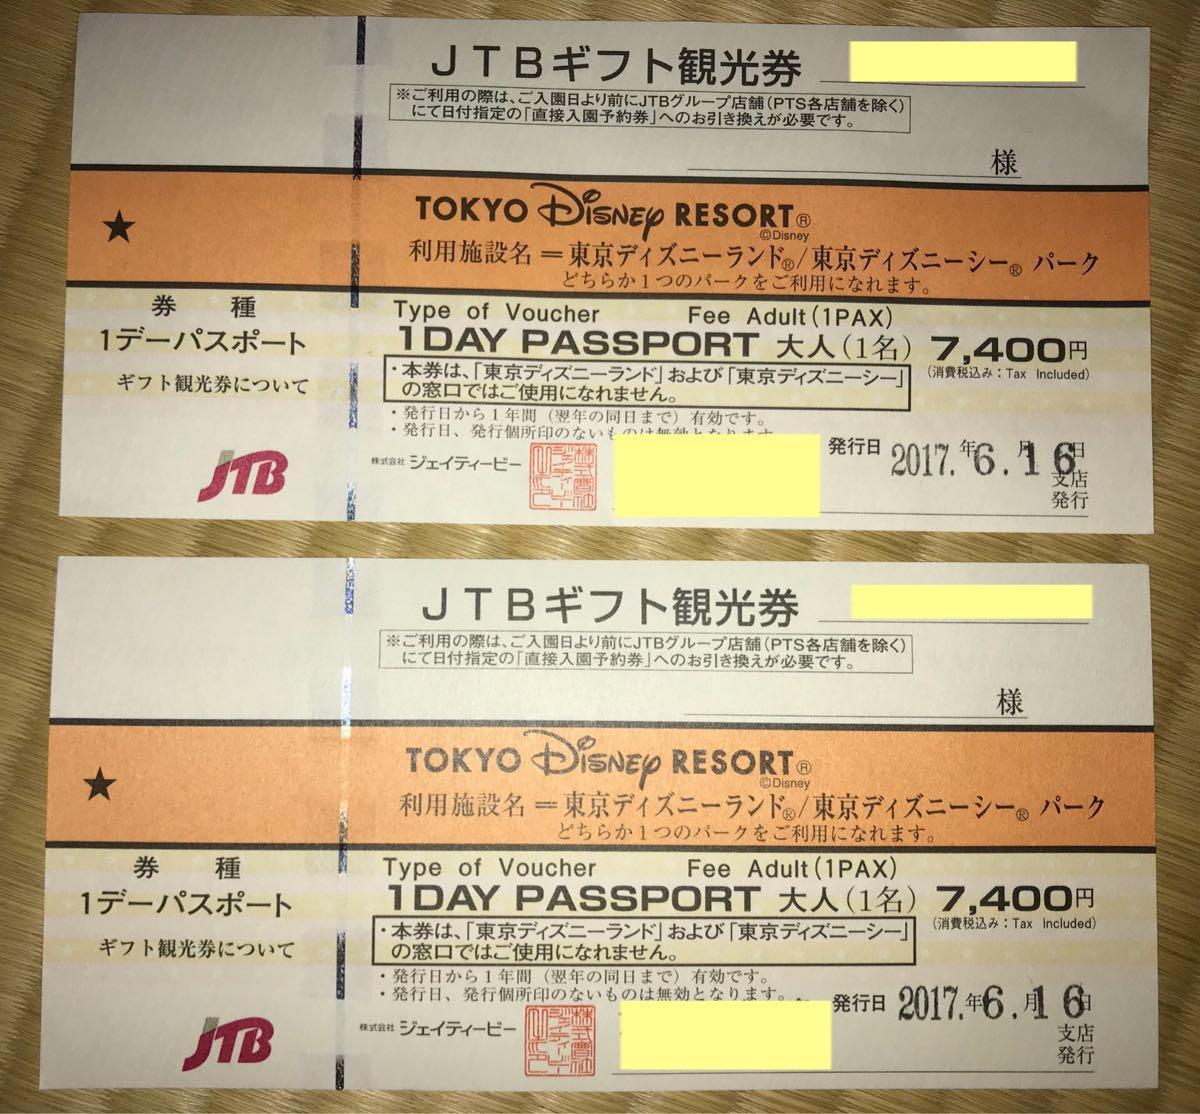 jtb 東京ディズニーリゾートの値段と価格推移は?|14件の売買情報を集計